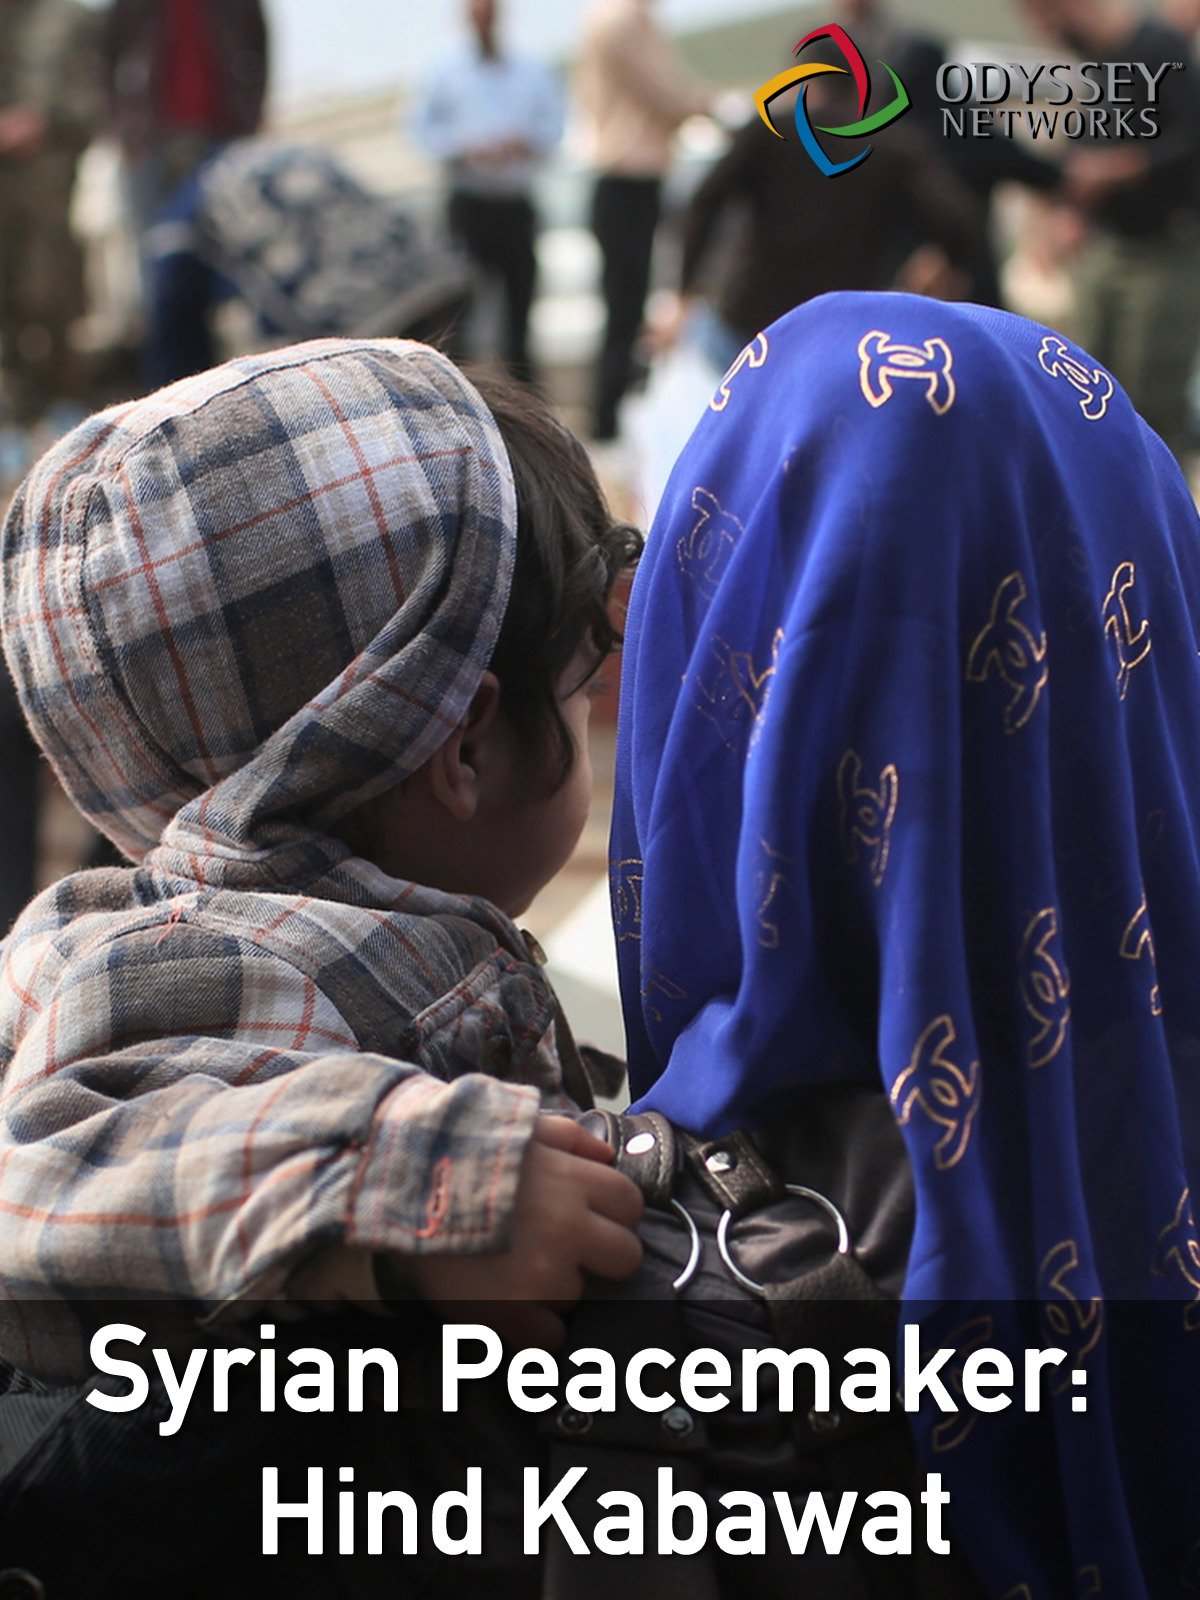 Clip: Syrian Peacemaker: Hind Kabawat